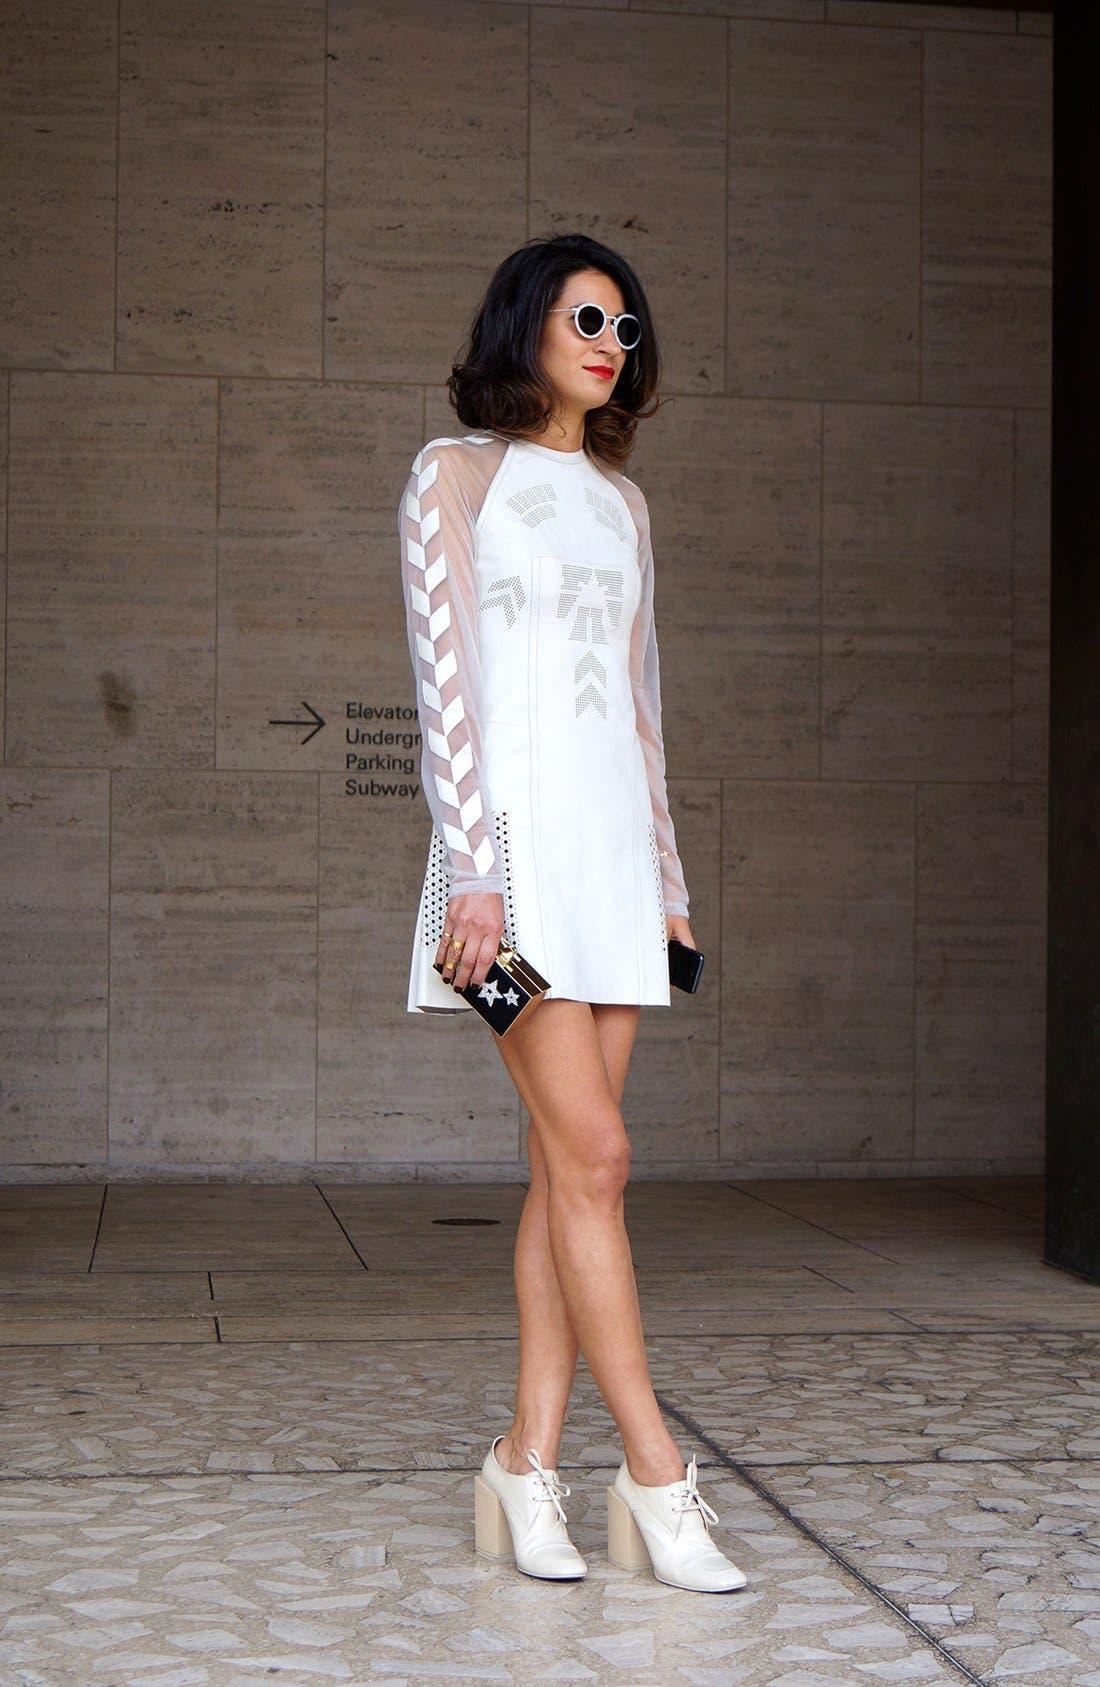 Main Image - Peekaboo Dress Street Style Look